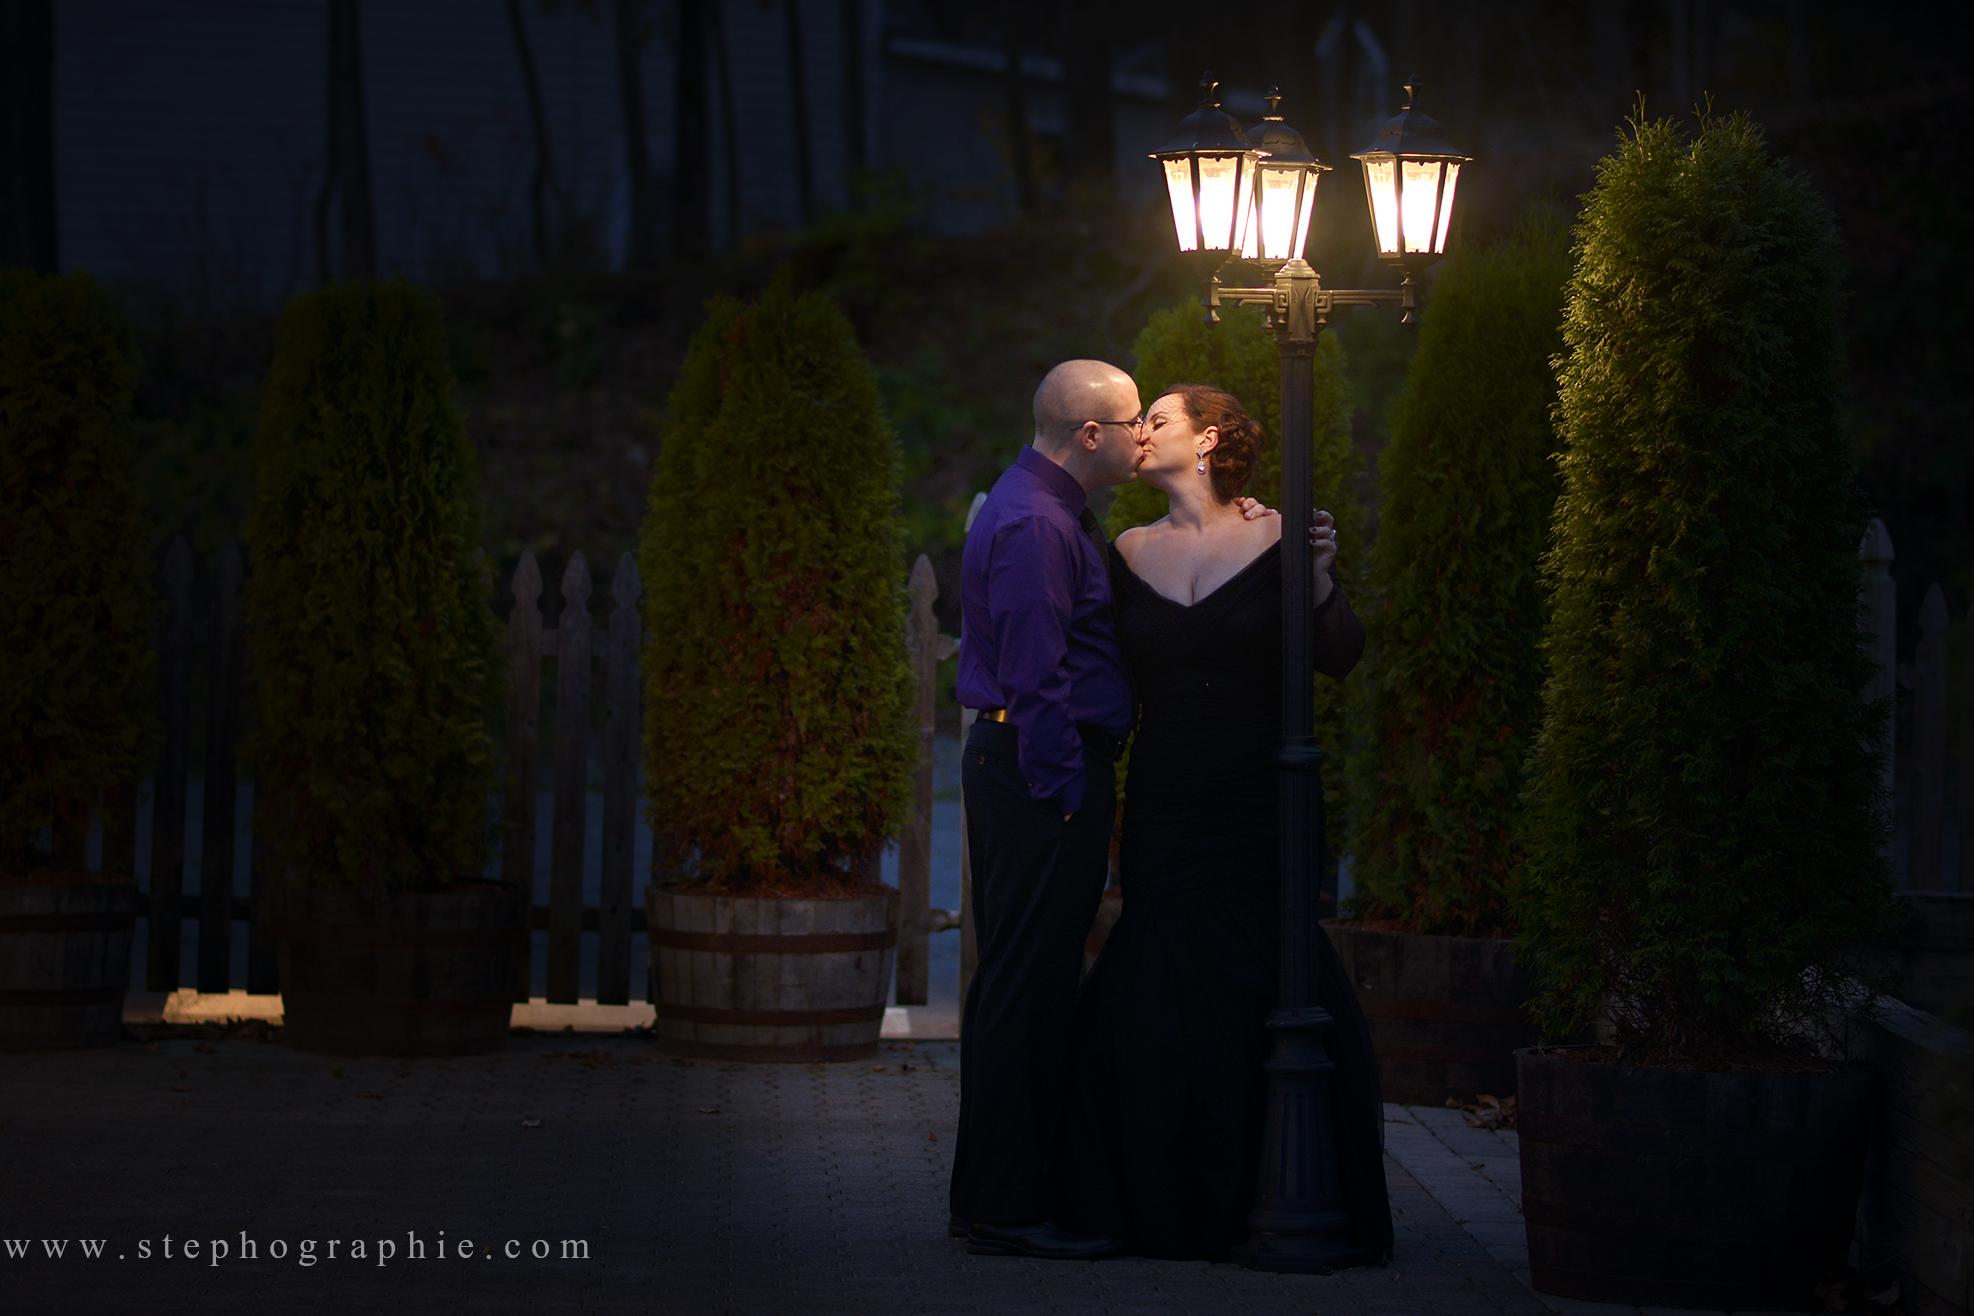 Ephographie black wedding dress bride offbeat bride